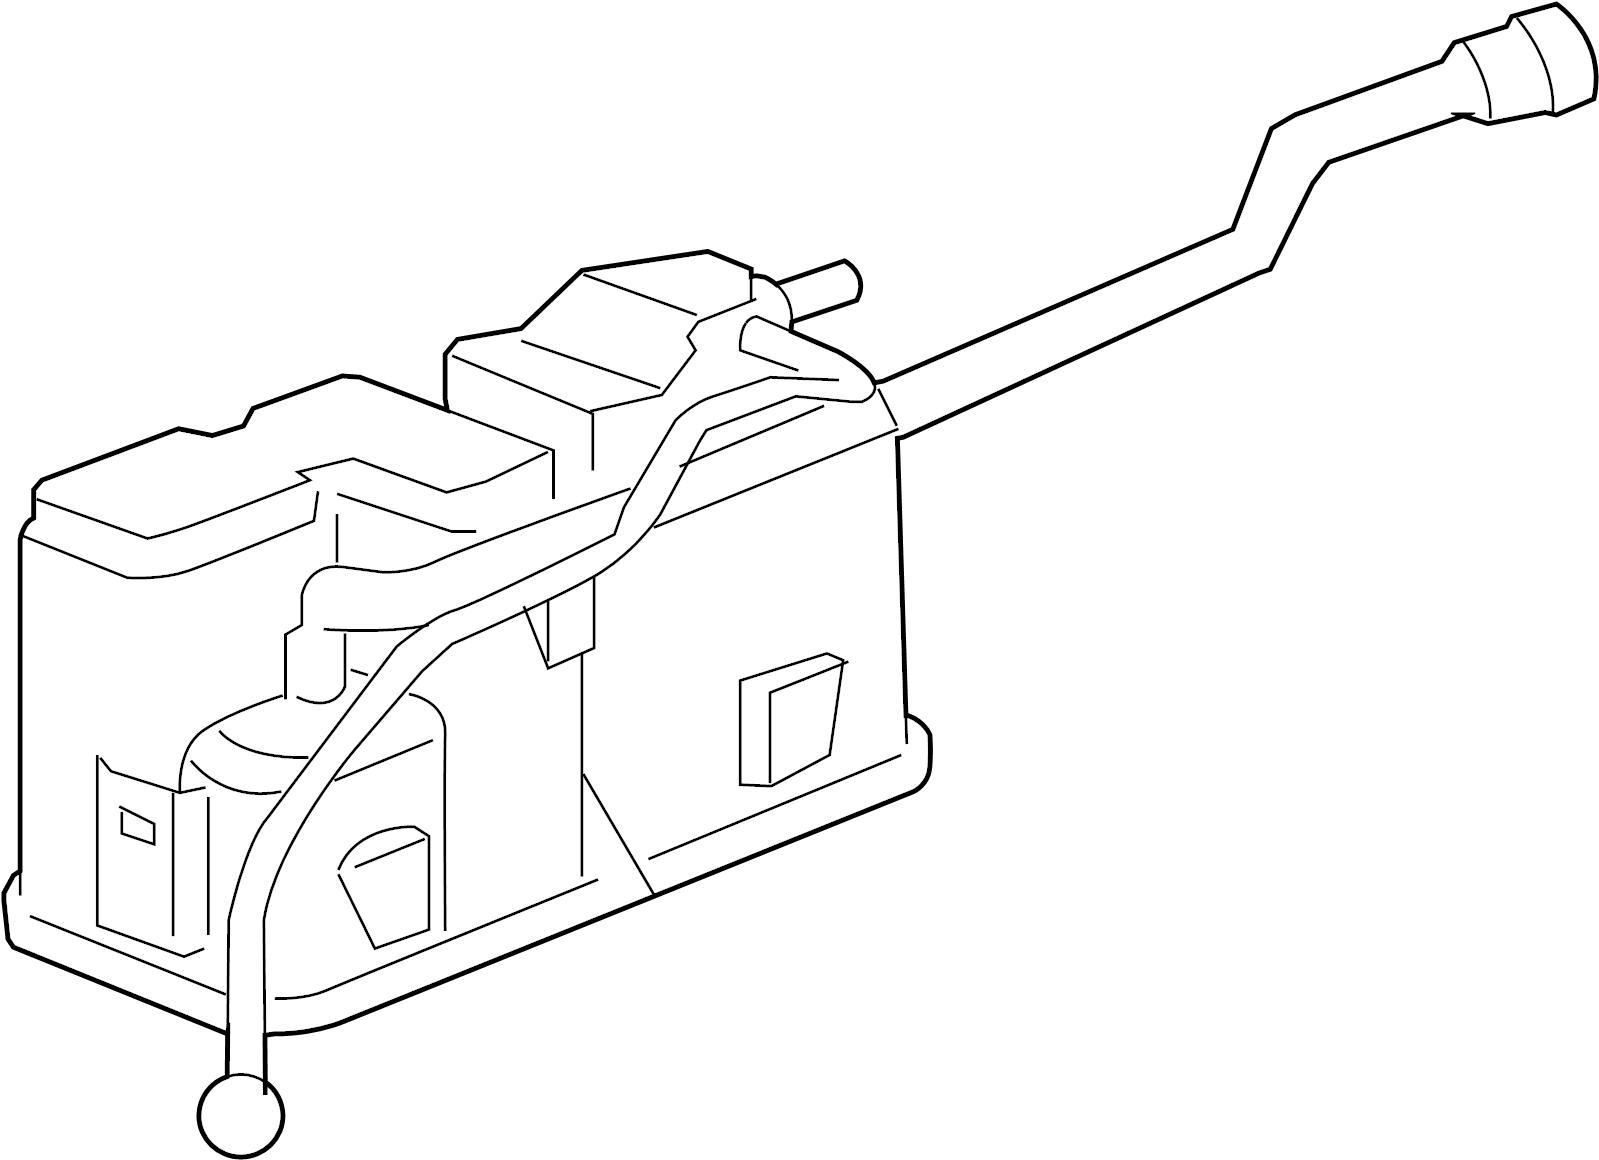 Pontiac G6 Fuel Tank Amp Mounting